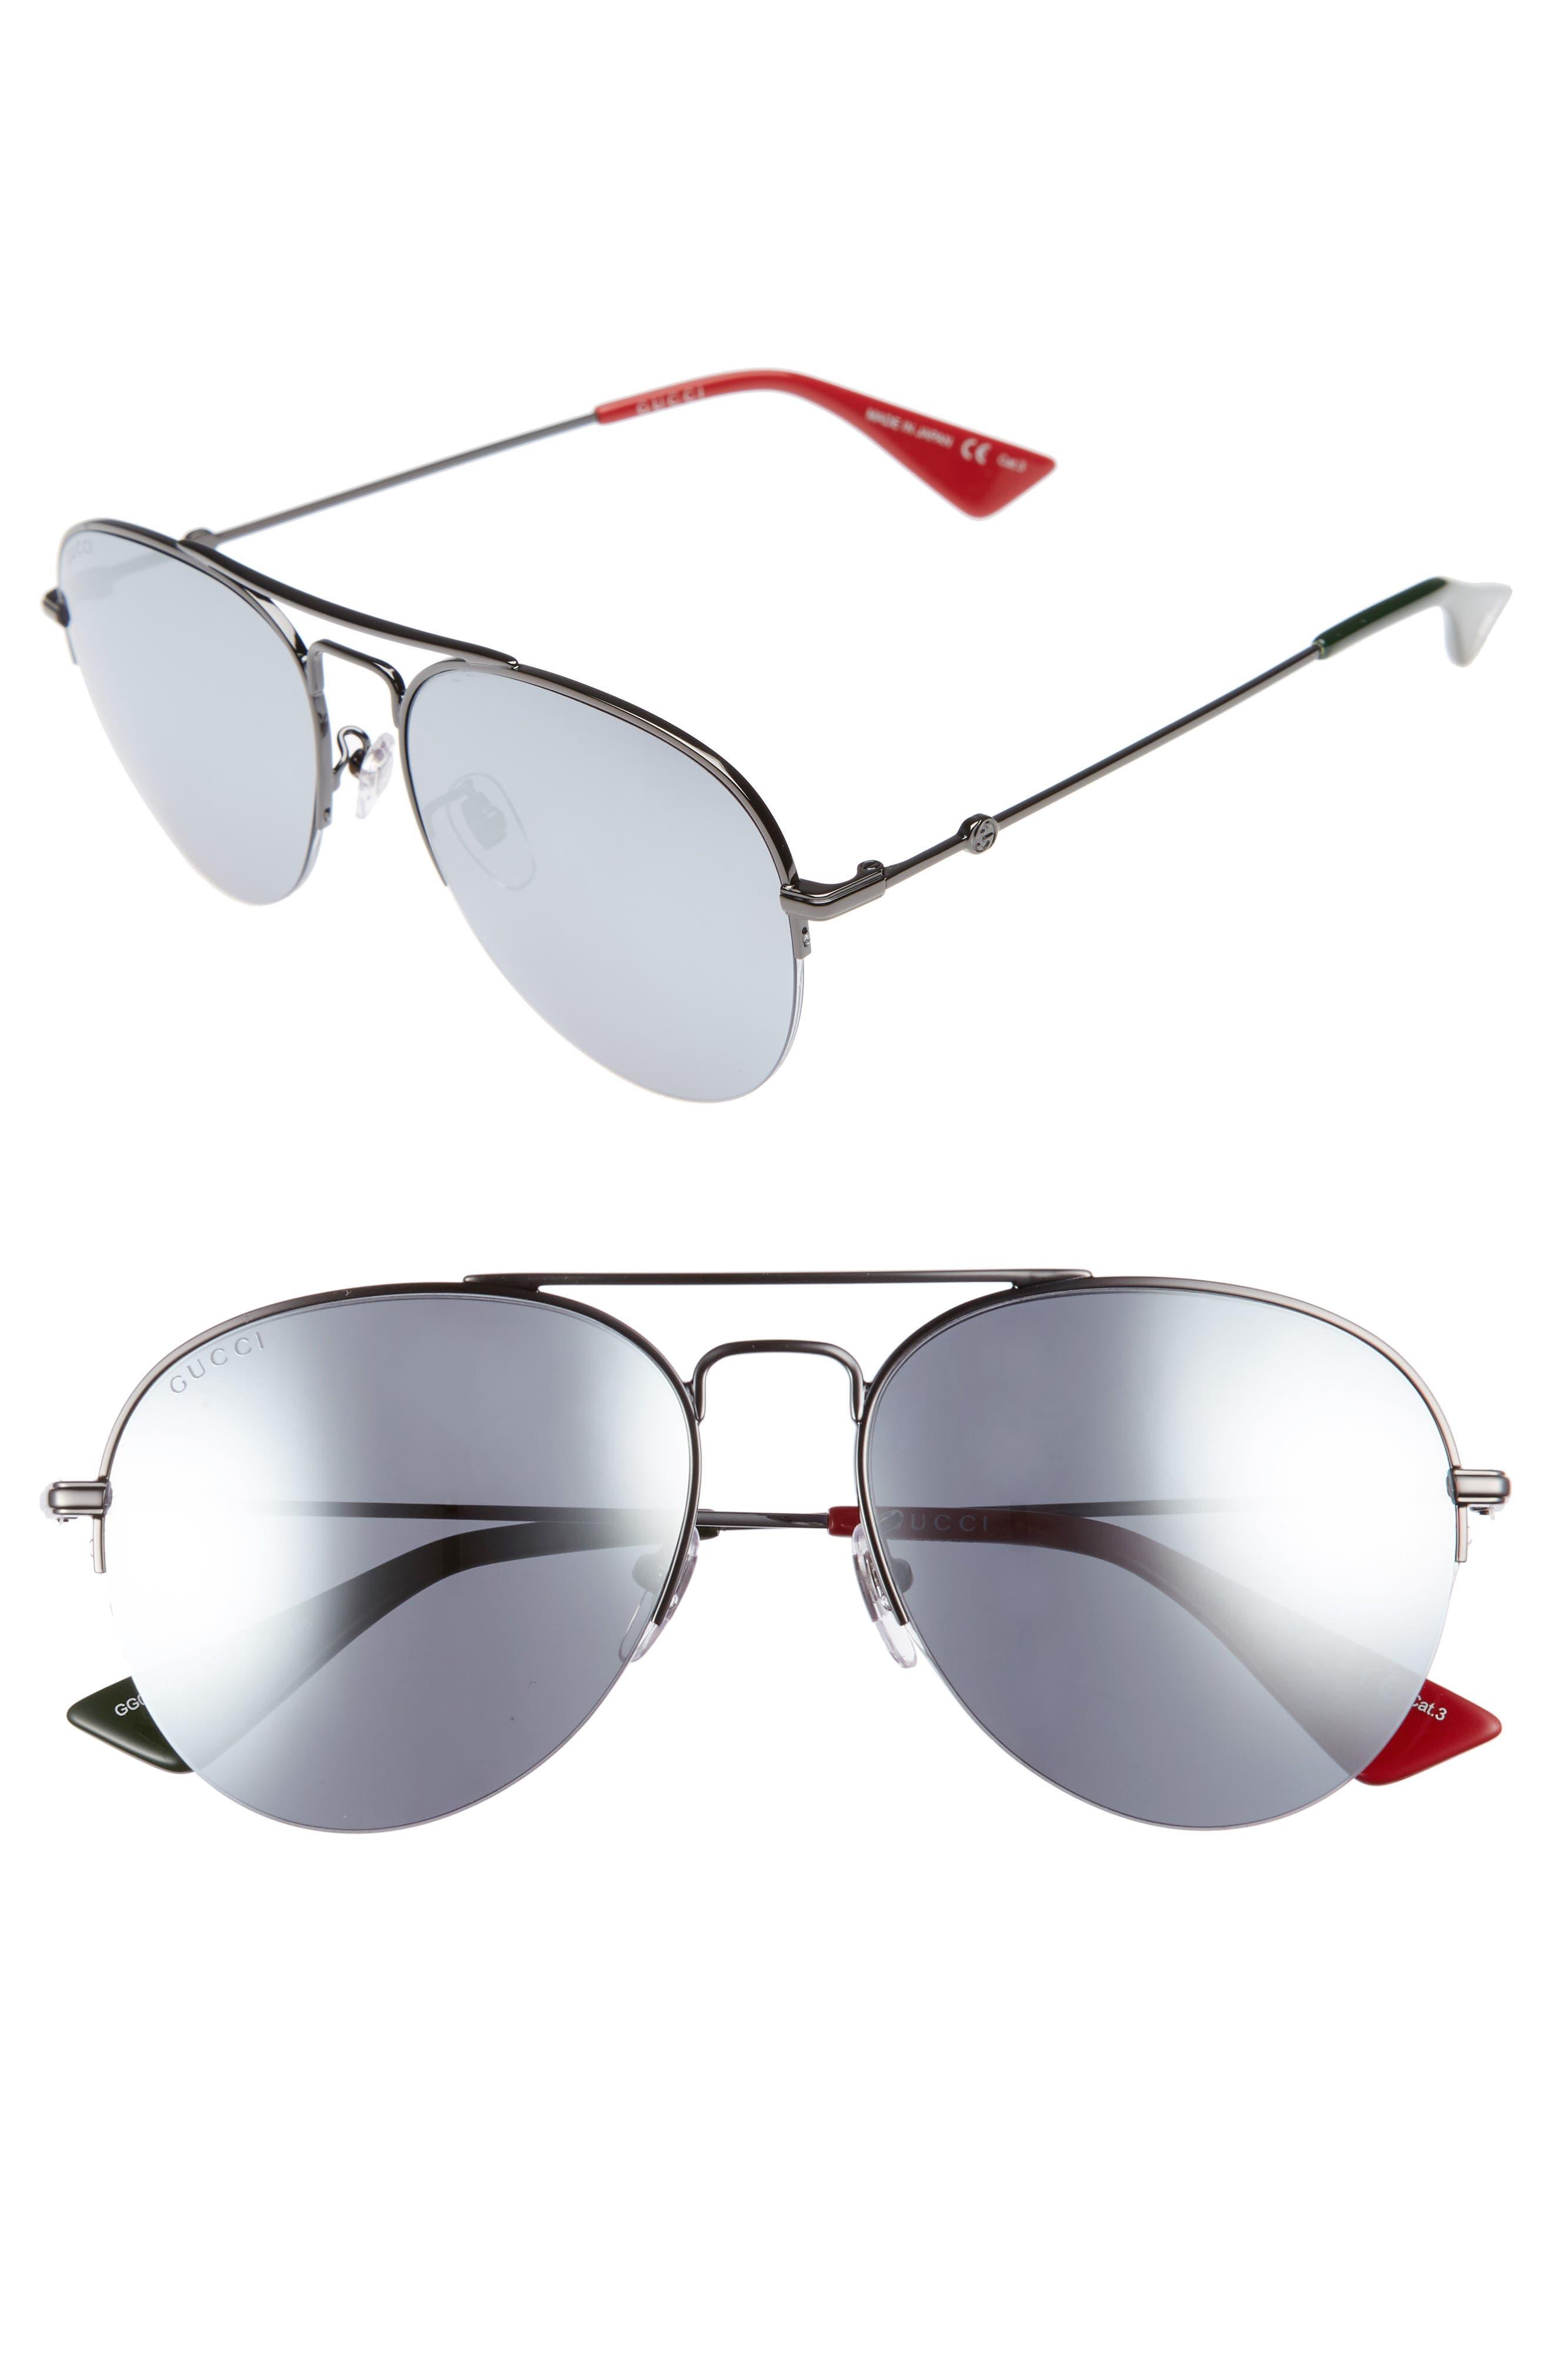 GUCCI, Pilot 56mm Aviator Sunglasses, Main thumbnail 1, color, 052